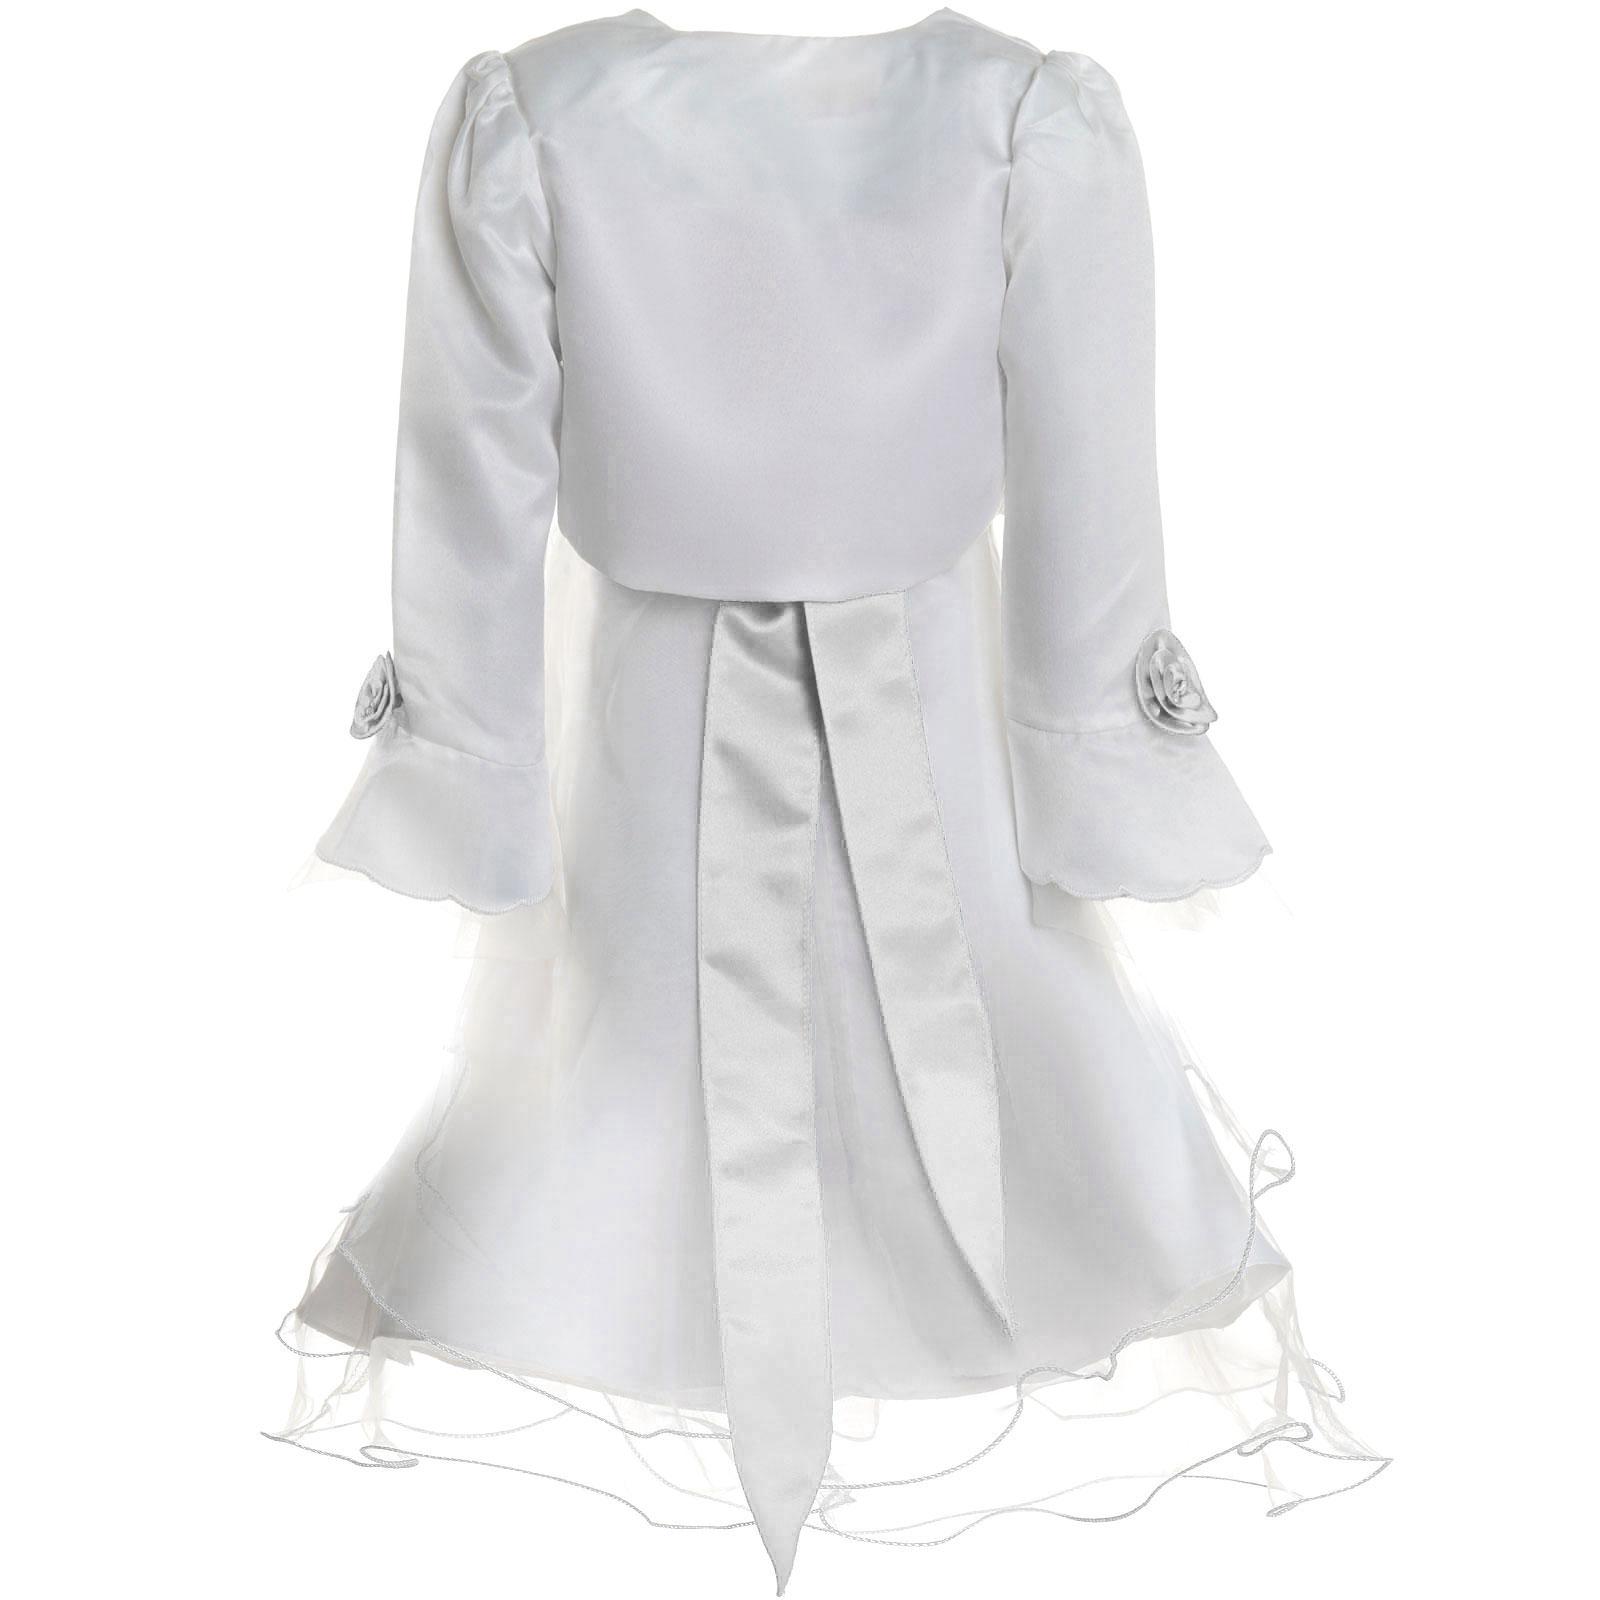 Maedchen-Kinder-Kleid-Peticoat-Festkleid-Lang-Arm-Kostuem-mit-Bolero-Rose-21476 Indexbild 23